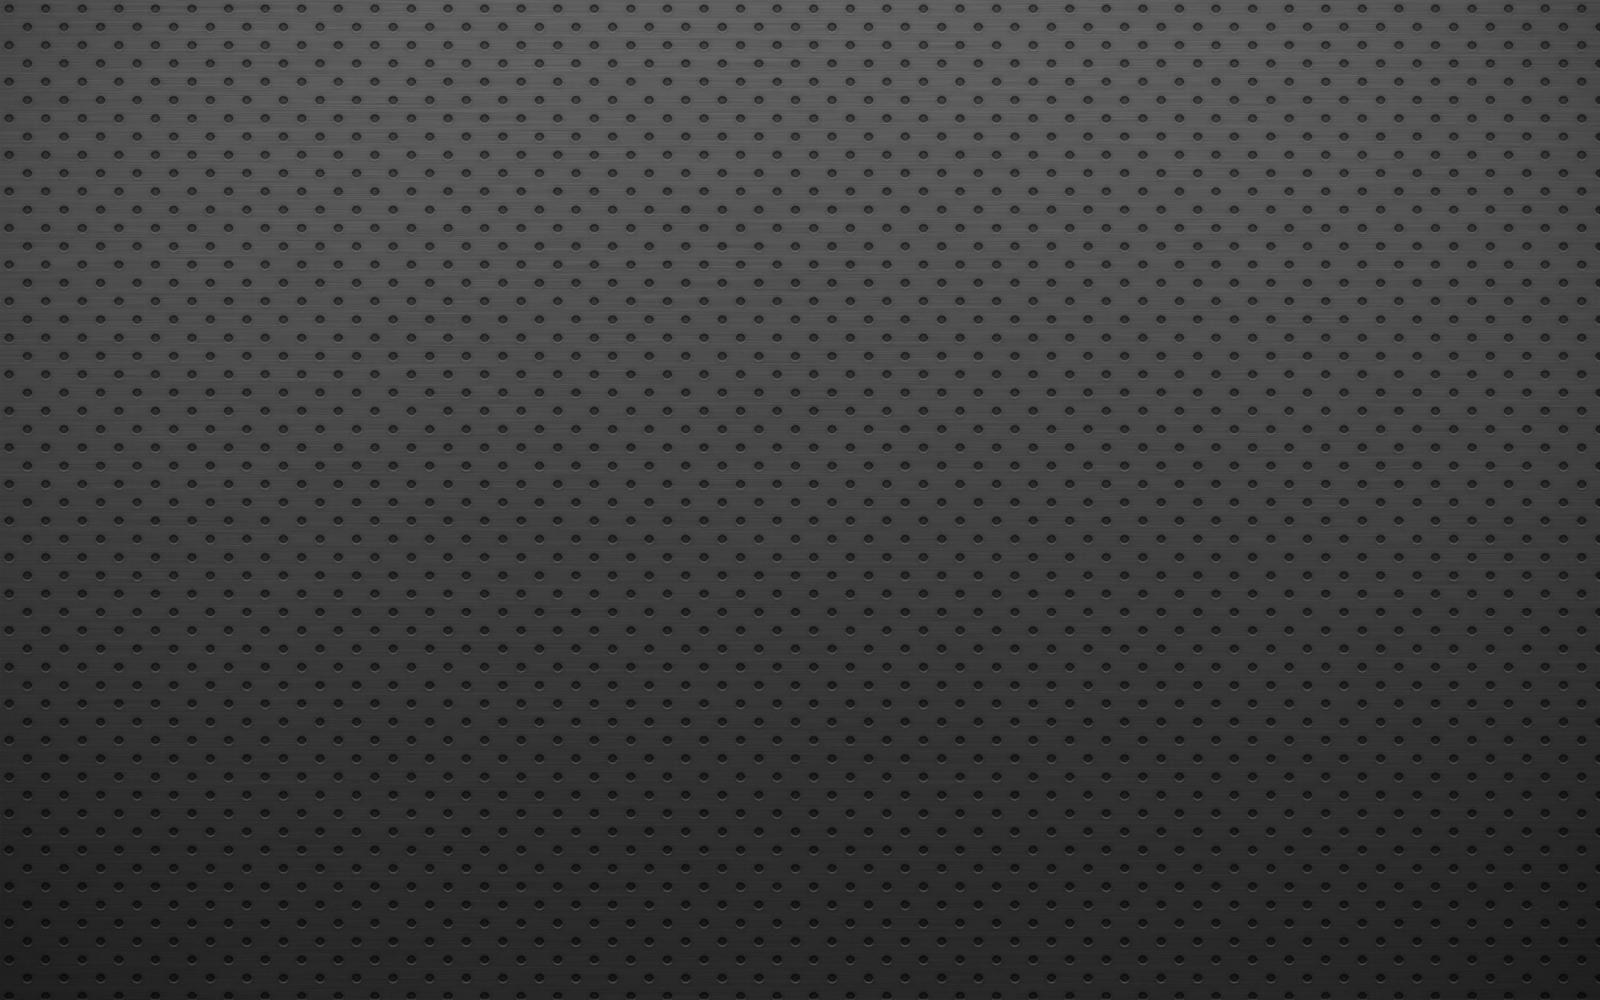 Hd Metal Wallpapers Metallic Backgrounds For Free Desktop Download Metallic Wallpaper Metal Background Black Metallic